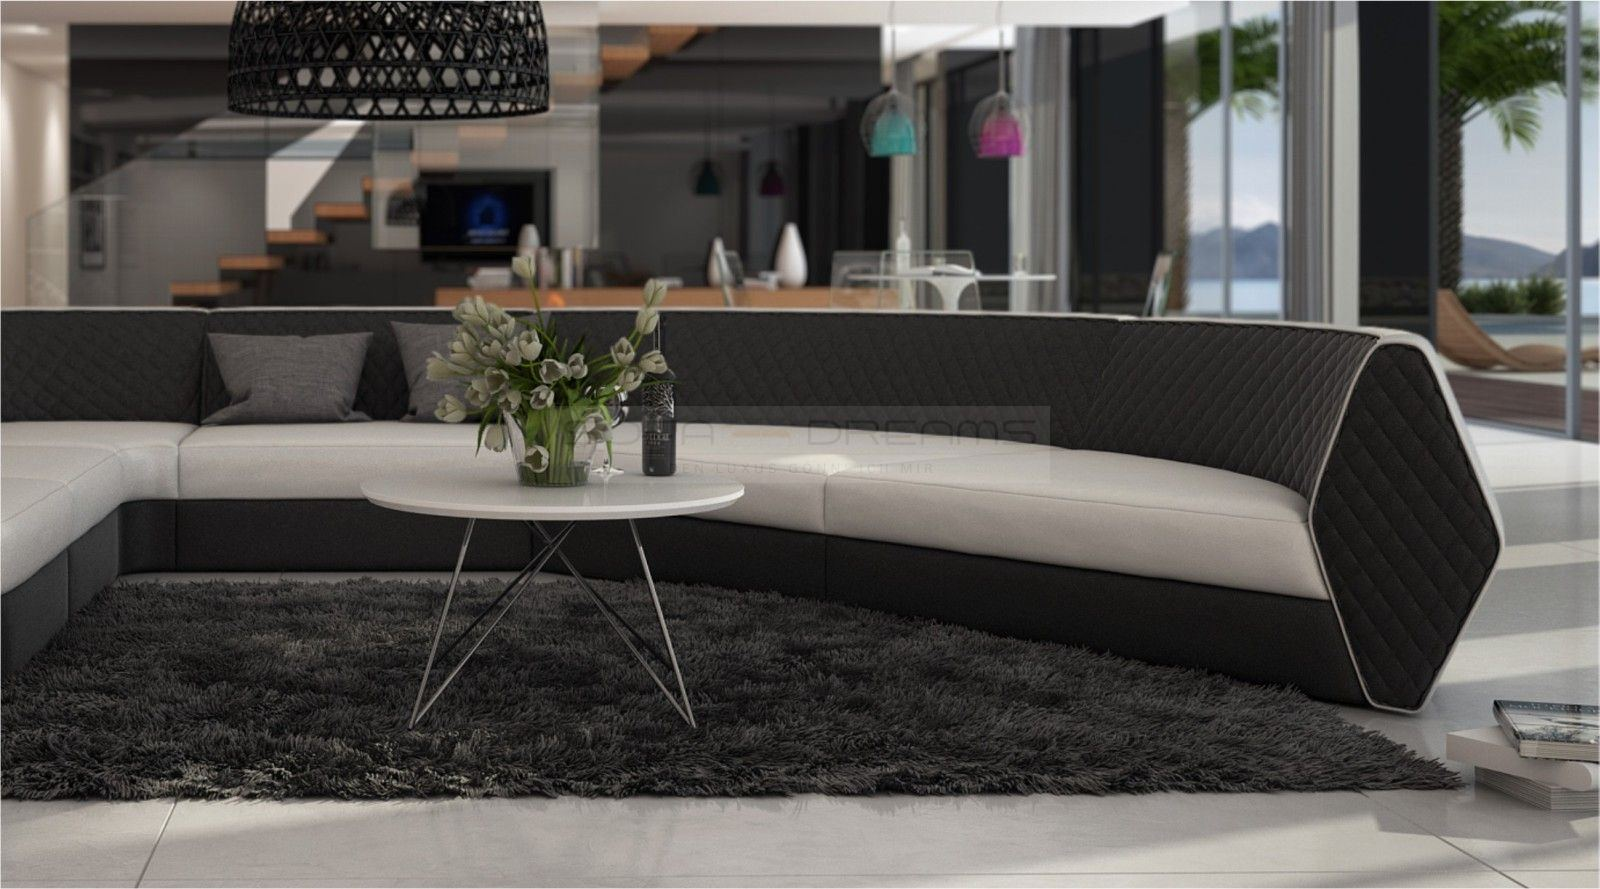 ledersofa nestare loungesofa designer couch luxussofa relaxsofa ebay. Black Bedroom Furniture Sets. Home Design Ideas